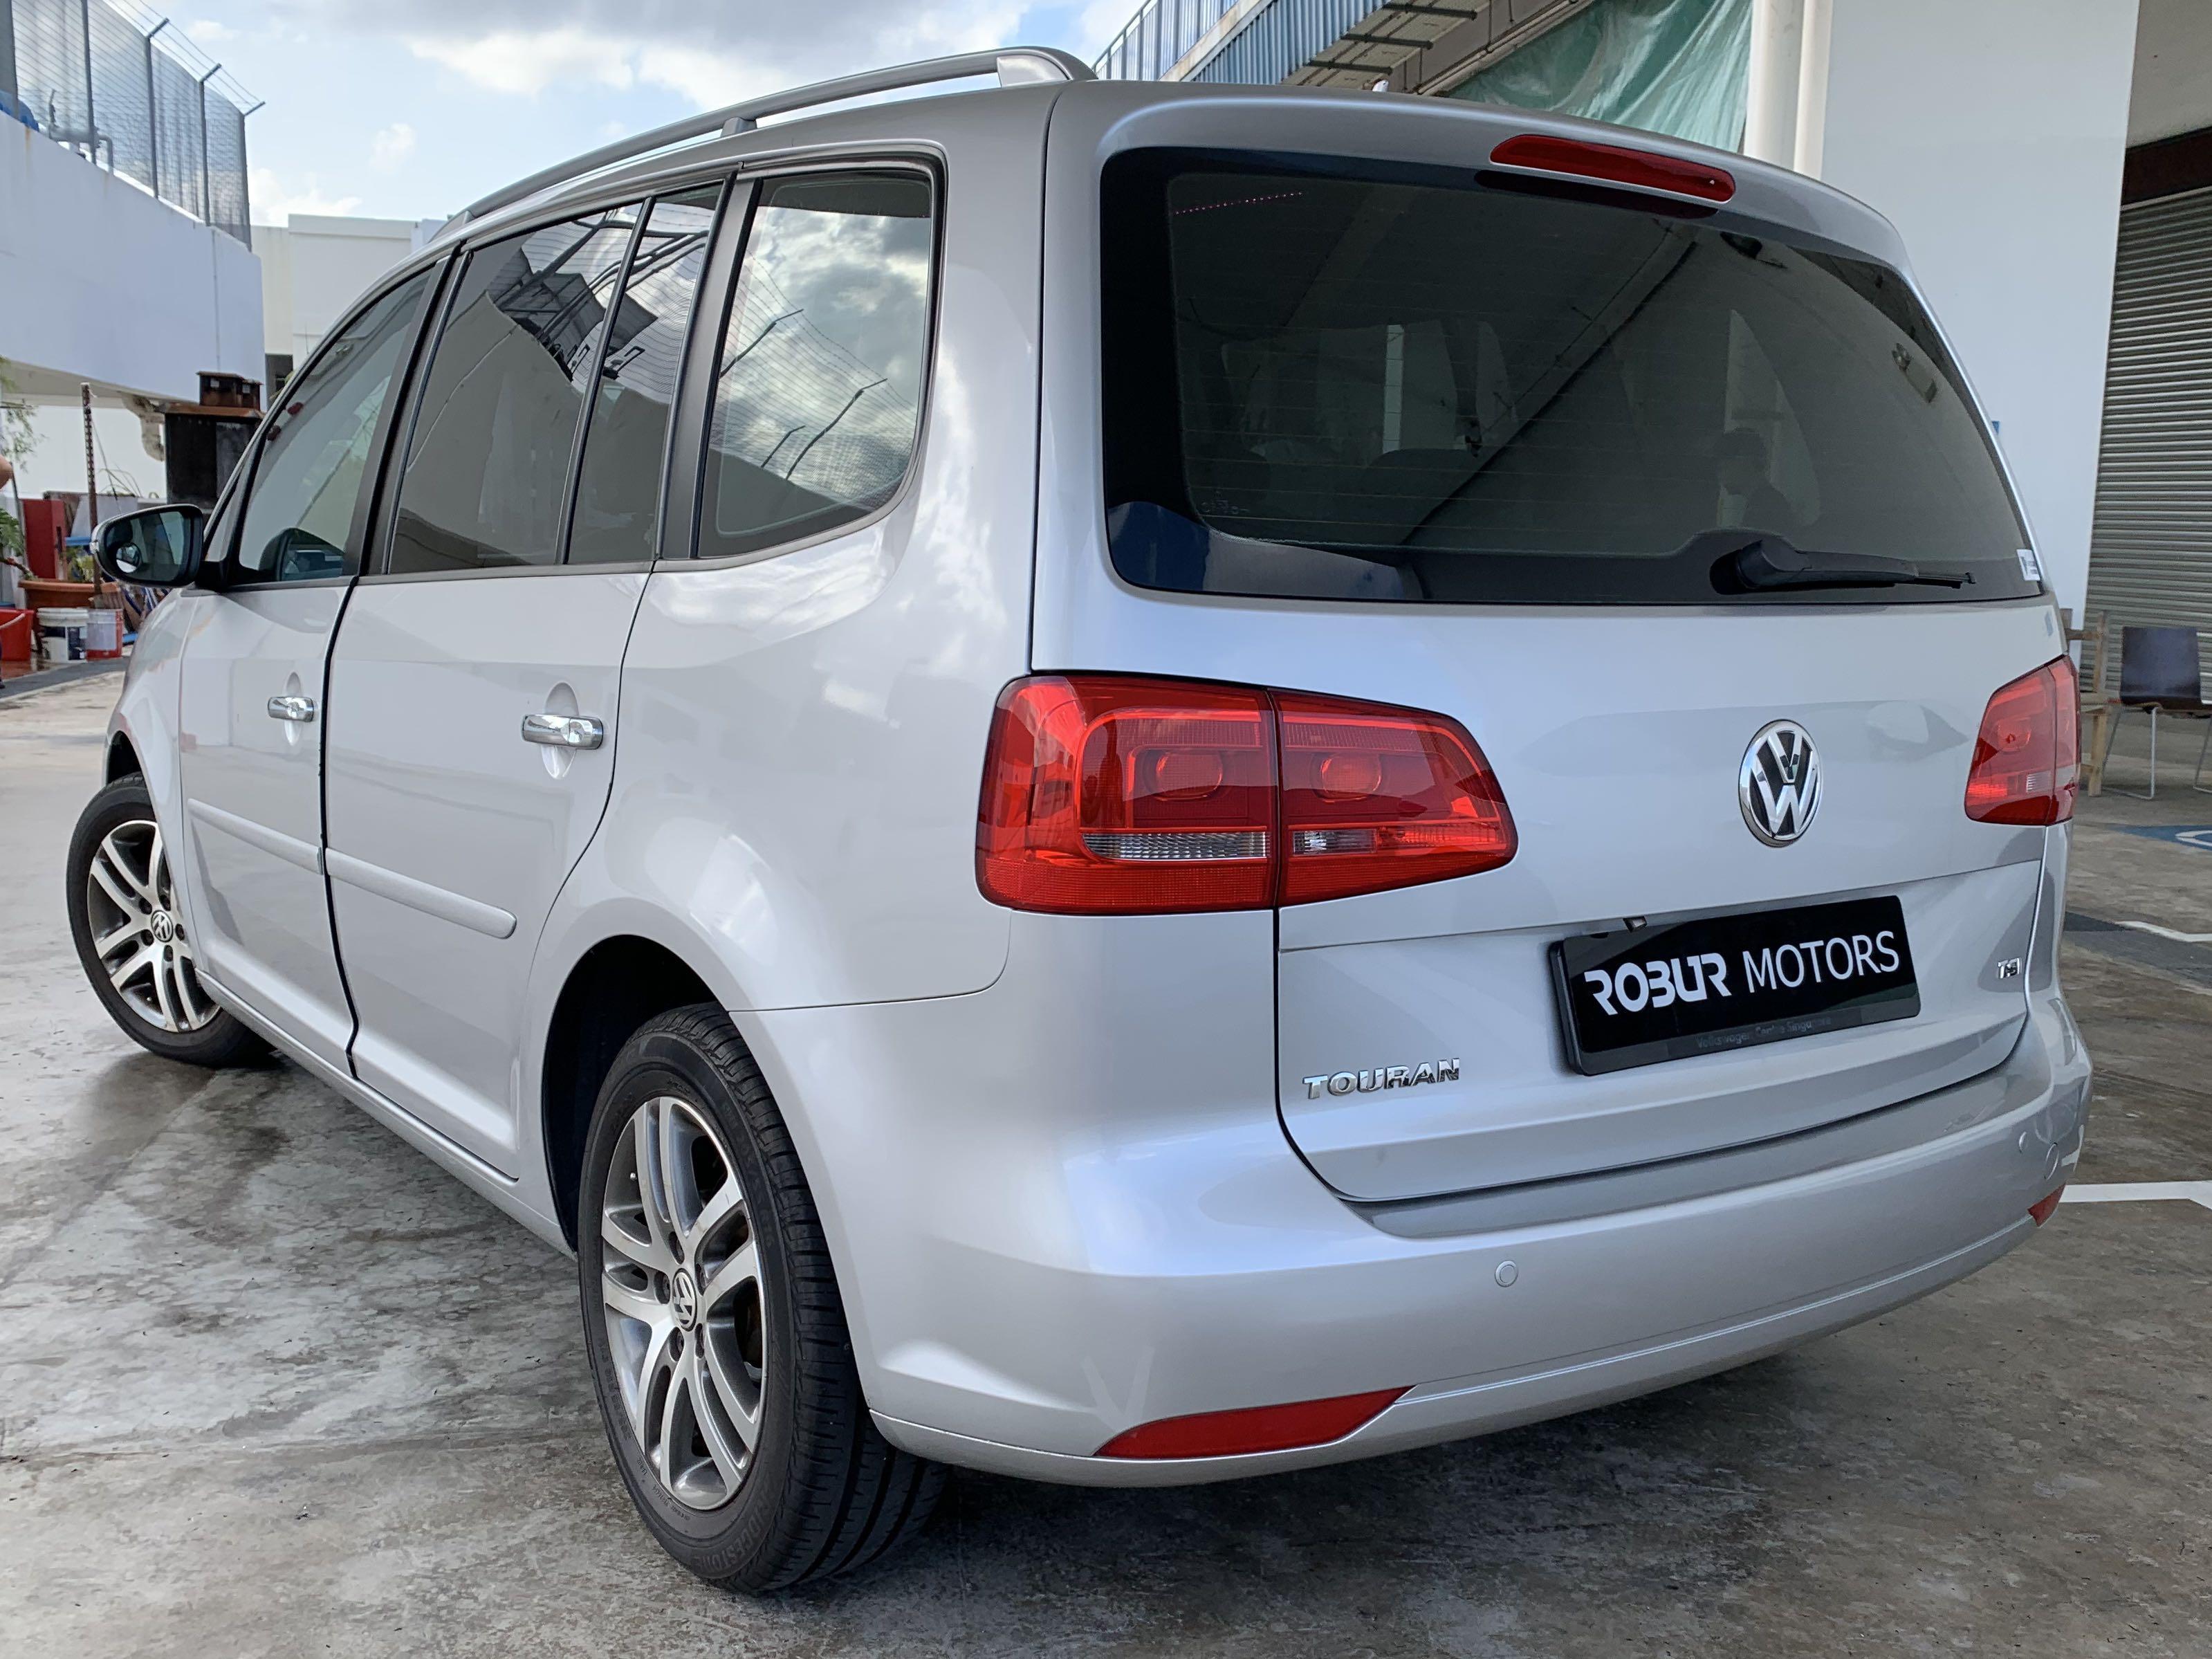 Volkswagen Touran 1.4A TSI (Cheap PHV Car Rental for Grab/ Gojek/ Tada/ Ryde)